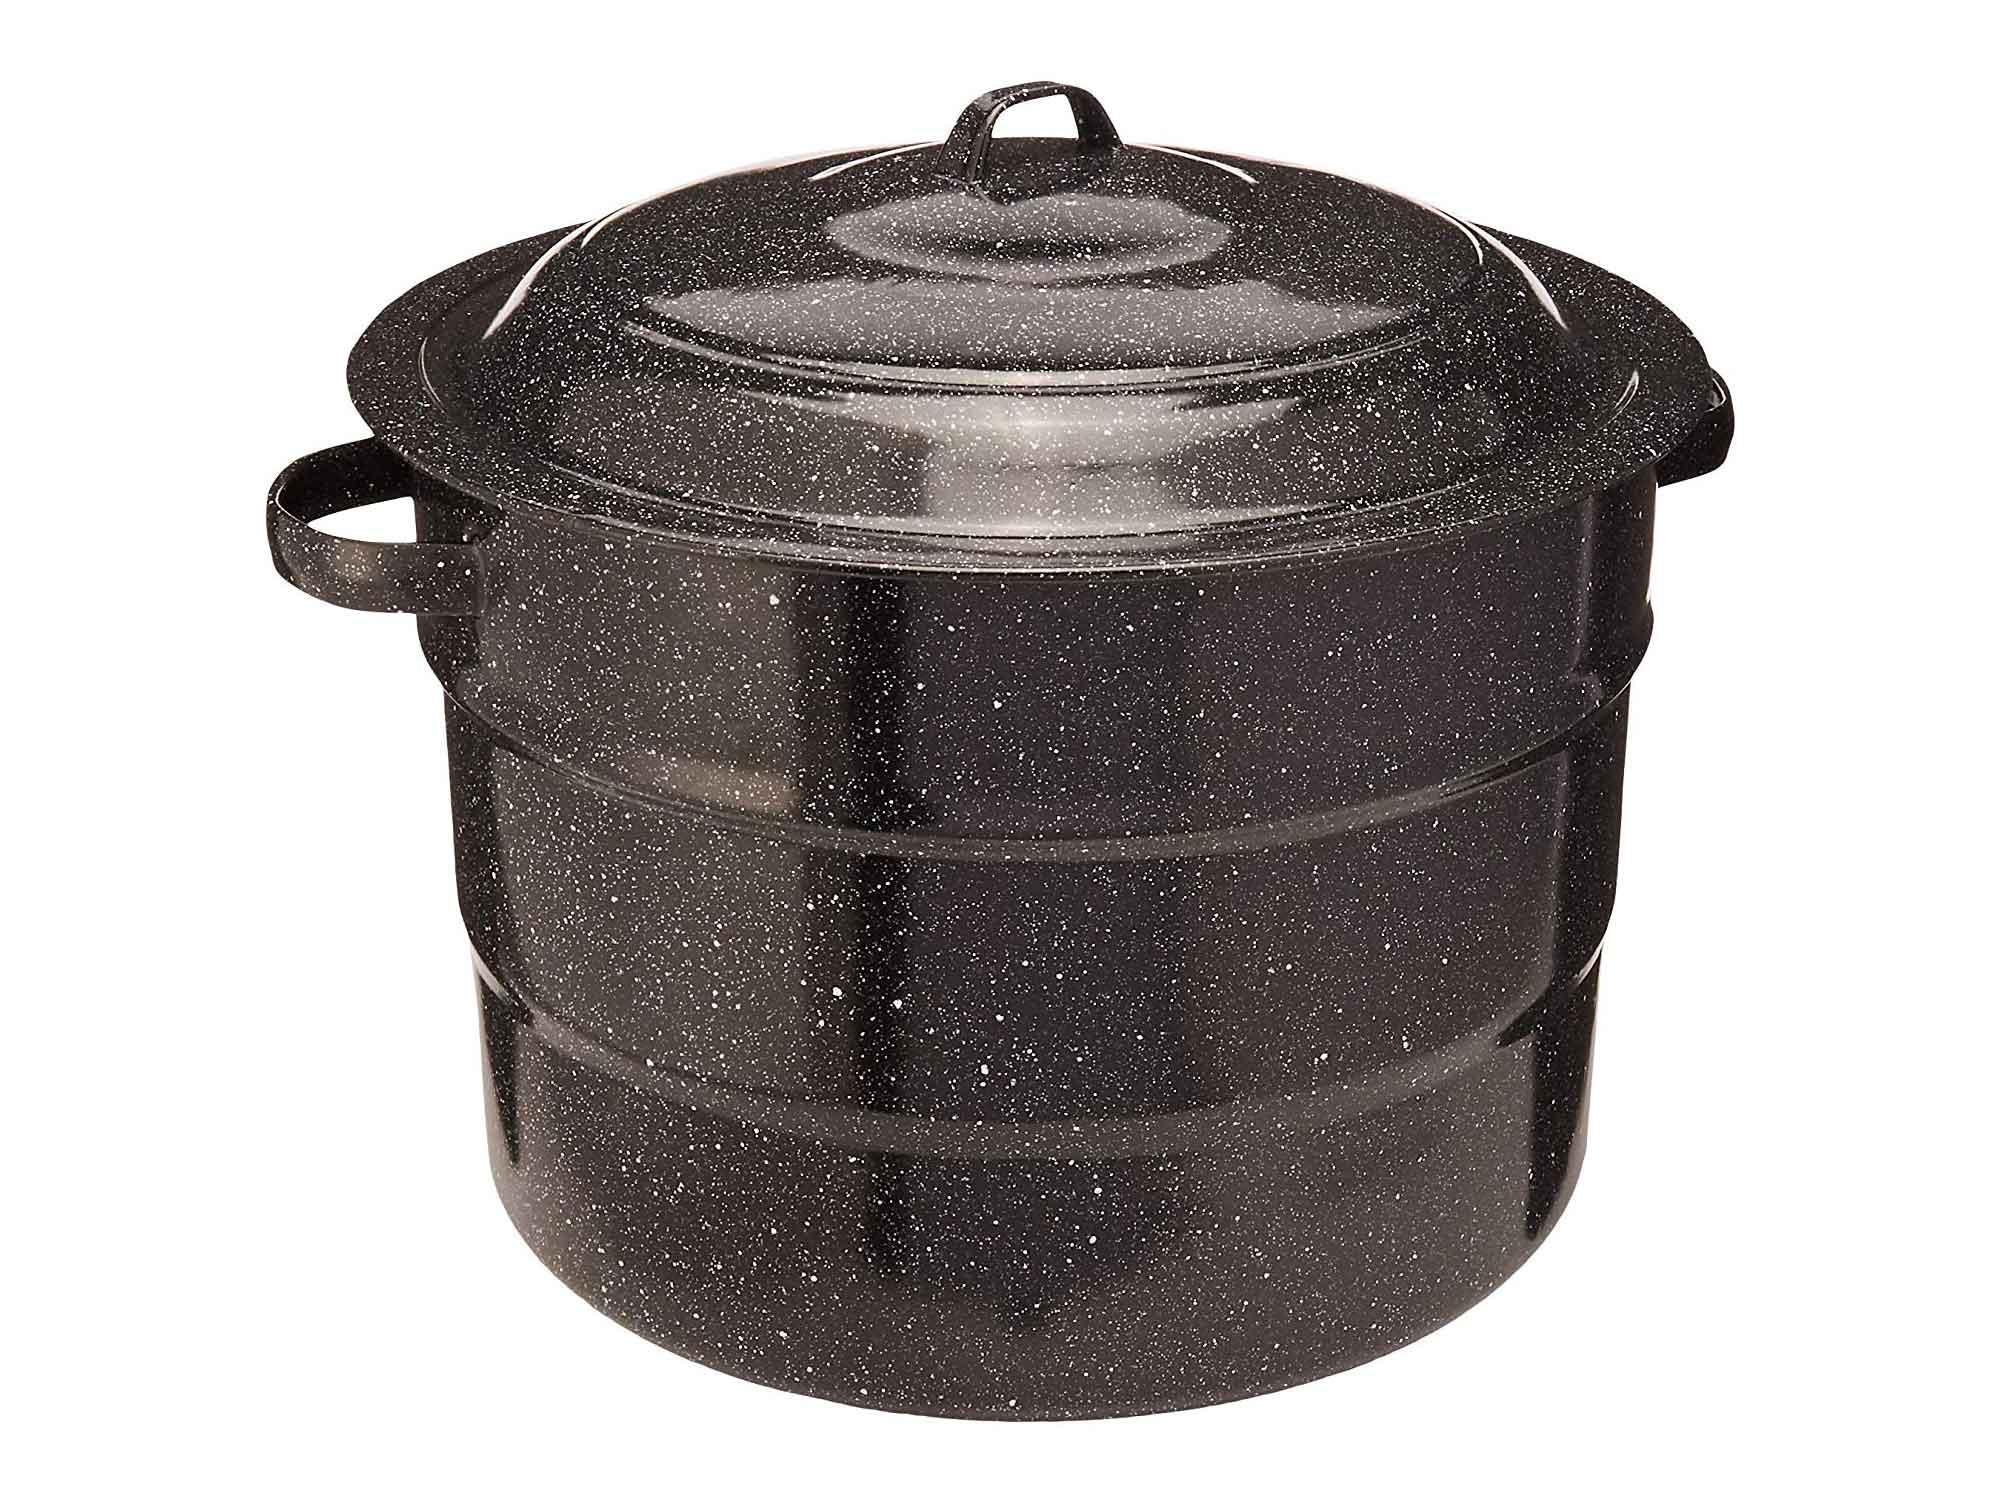 Black enamel canning pot